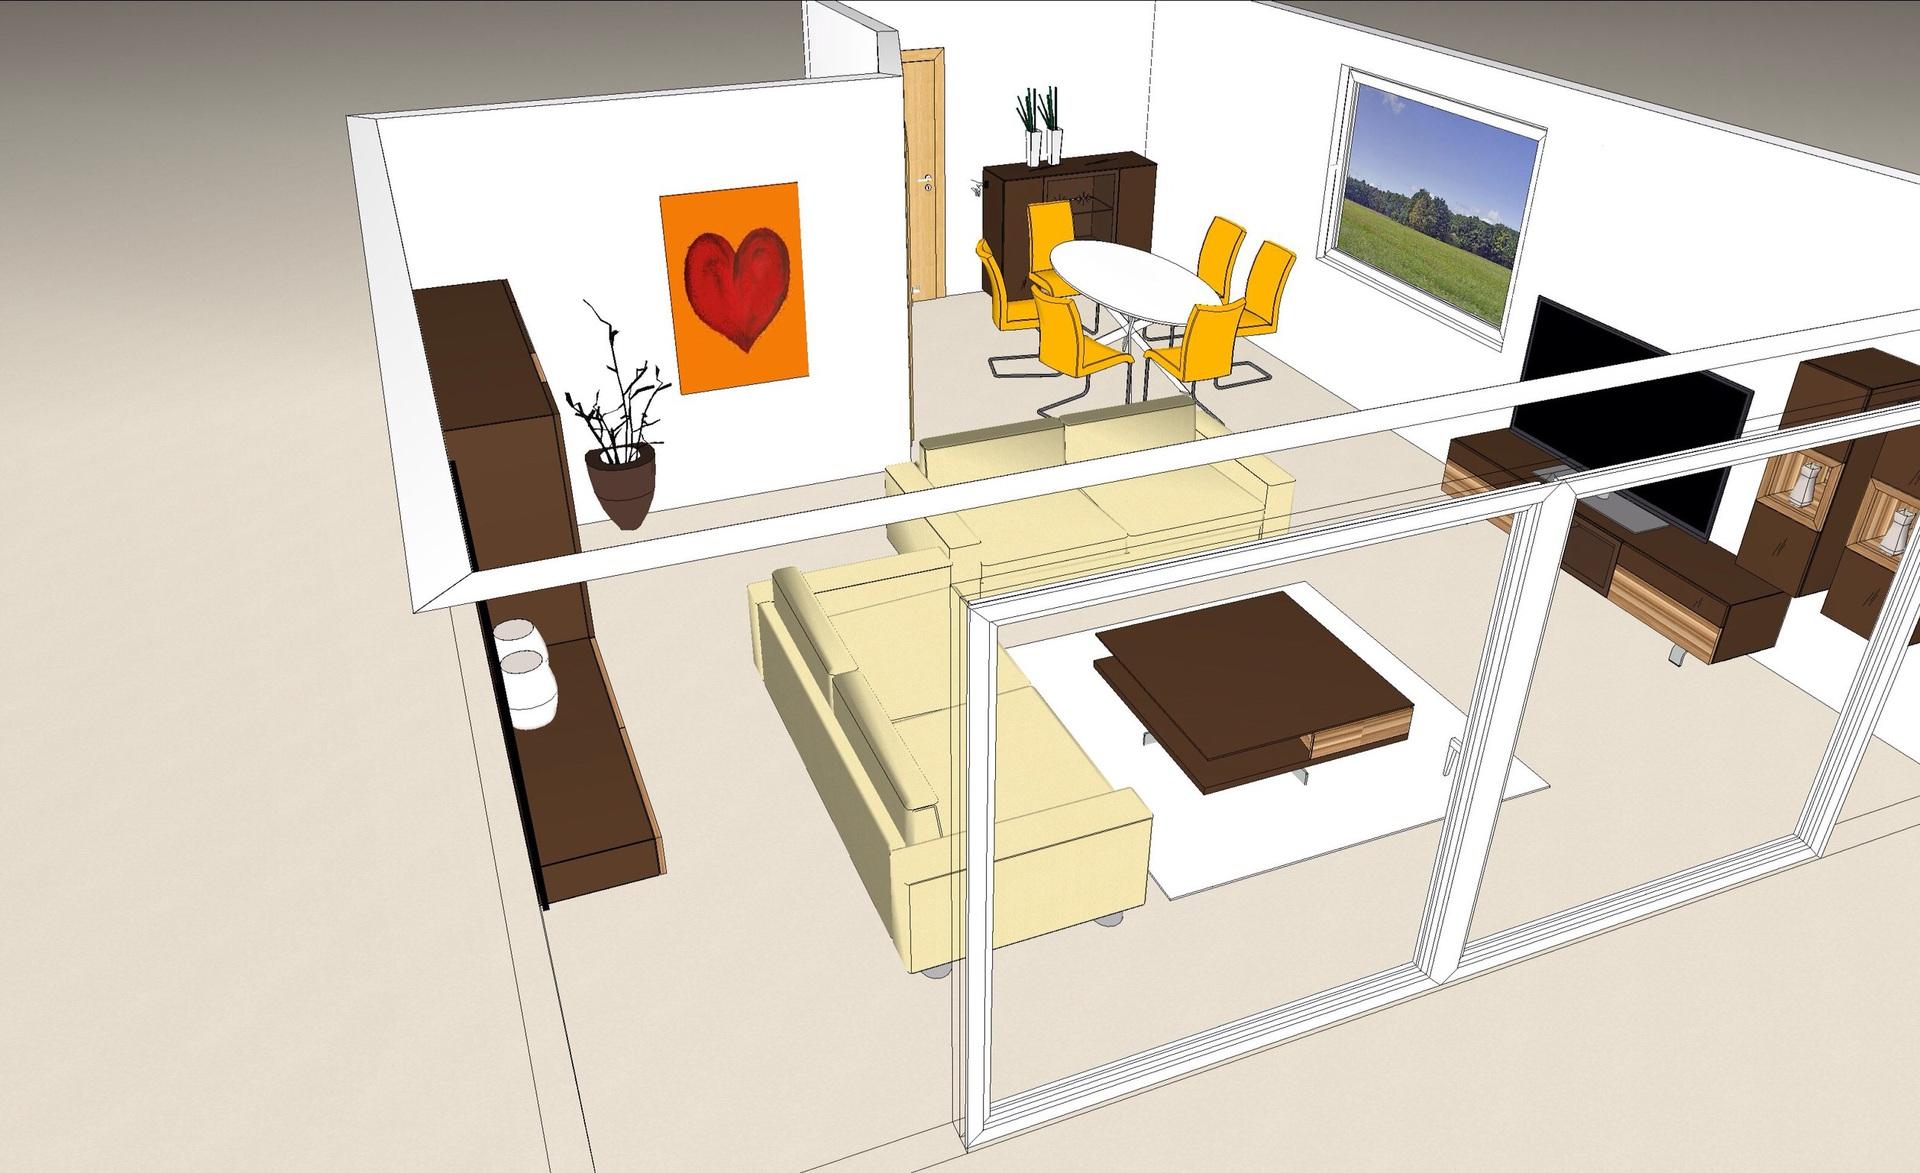 Wohnzimmer Raumplanung 1